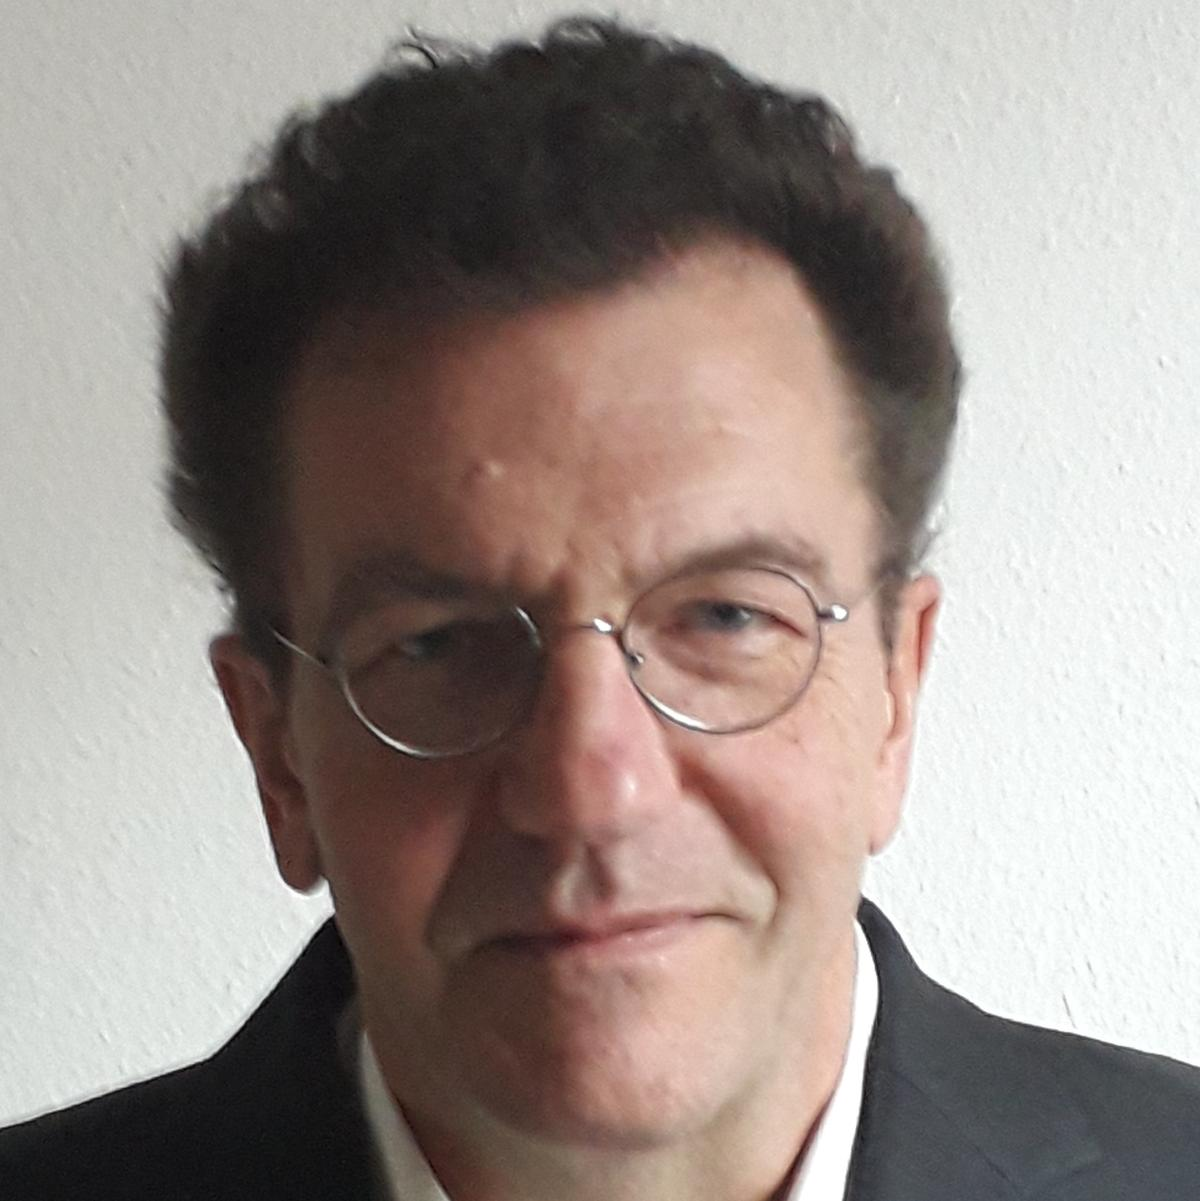 Felix Lincke